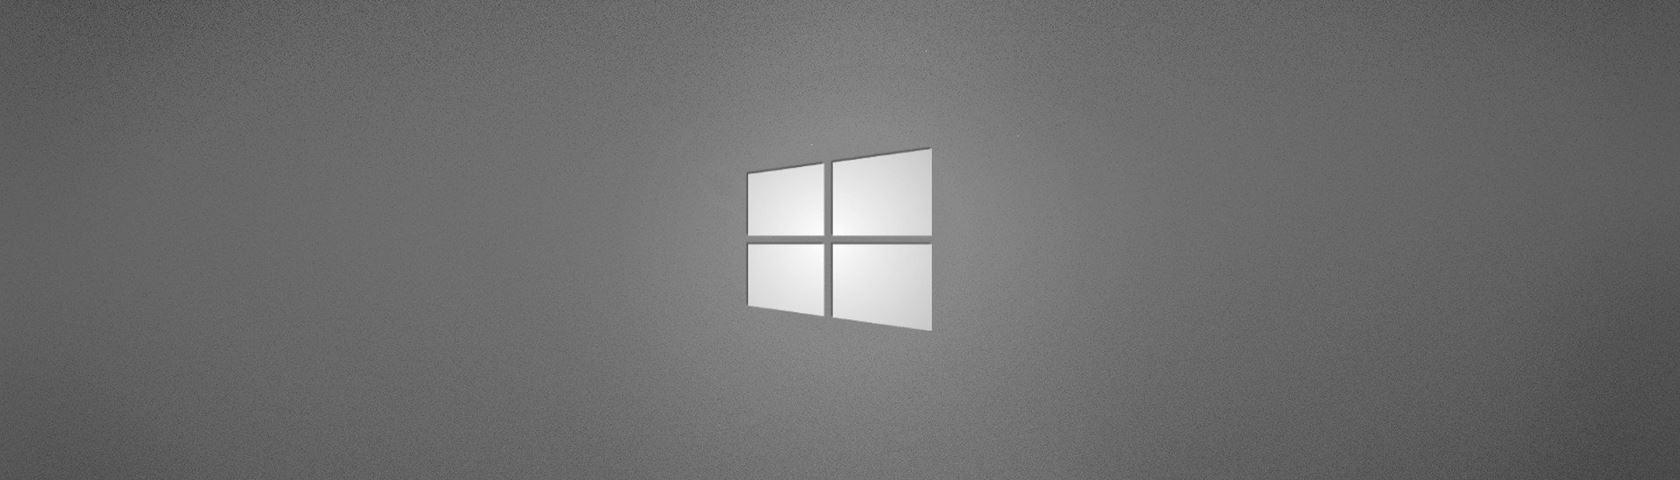 Gray Windows